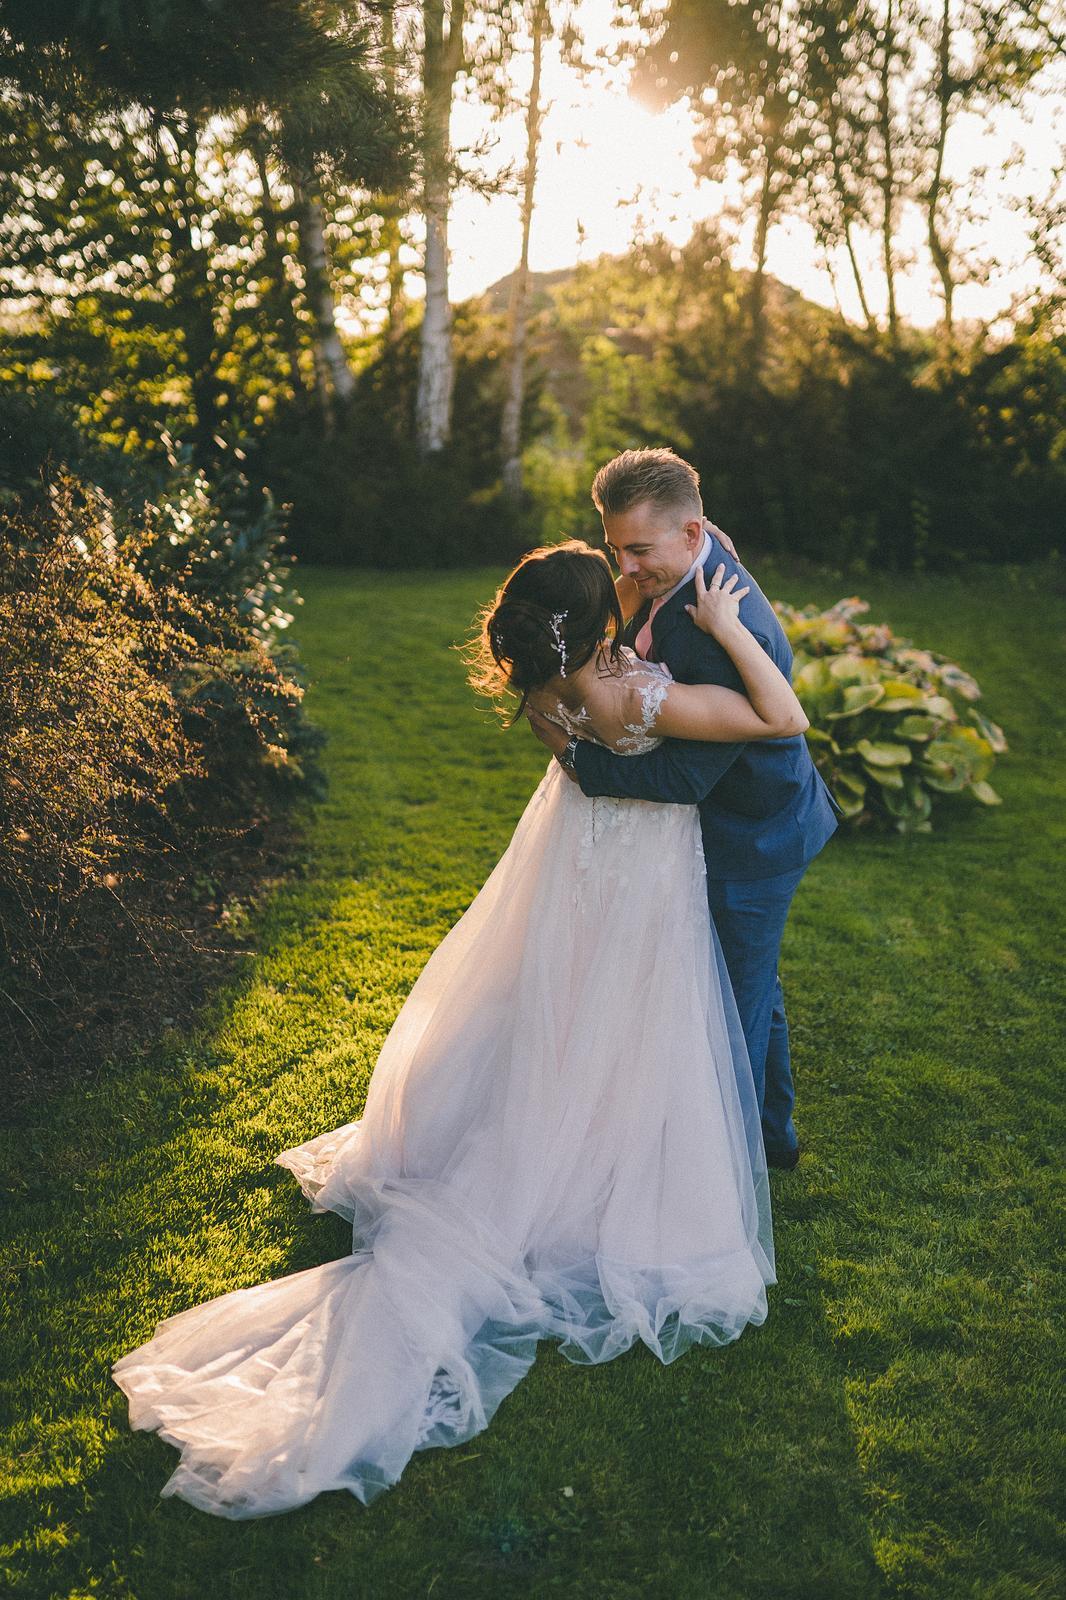 Svatba Ž&M - Obrázek č. 4